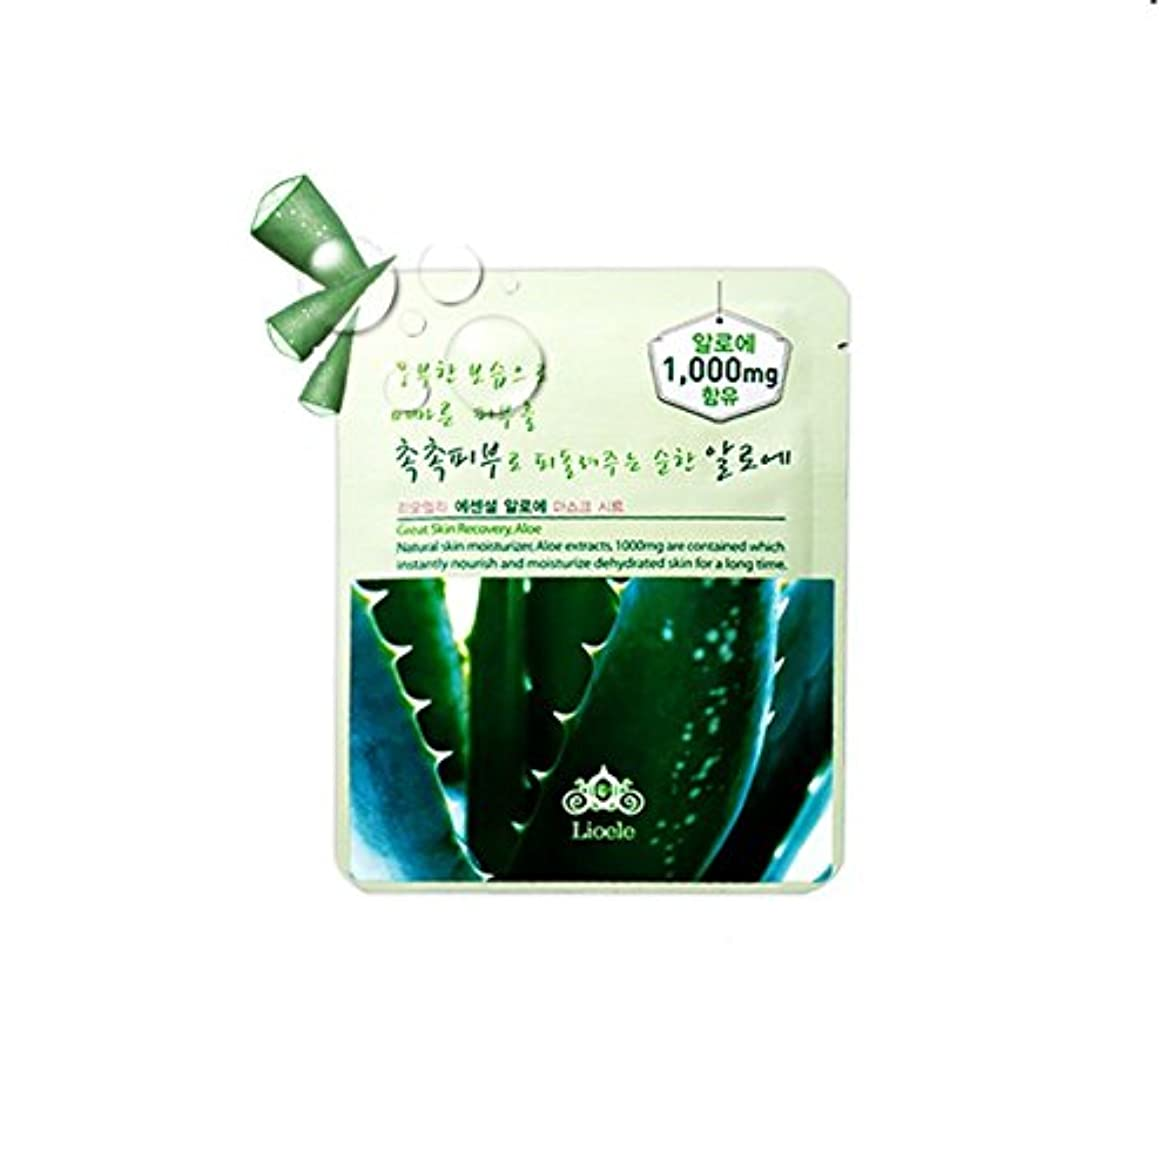 Lioele (リオエリ) エッセンシャル マスク シート / Essential Mask Sheet (アロエ (Aloe Mask Sheet)) [並行輸入品]